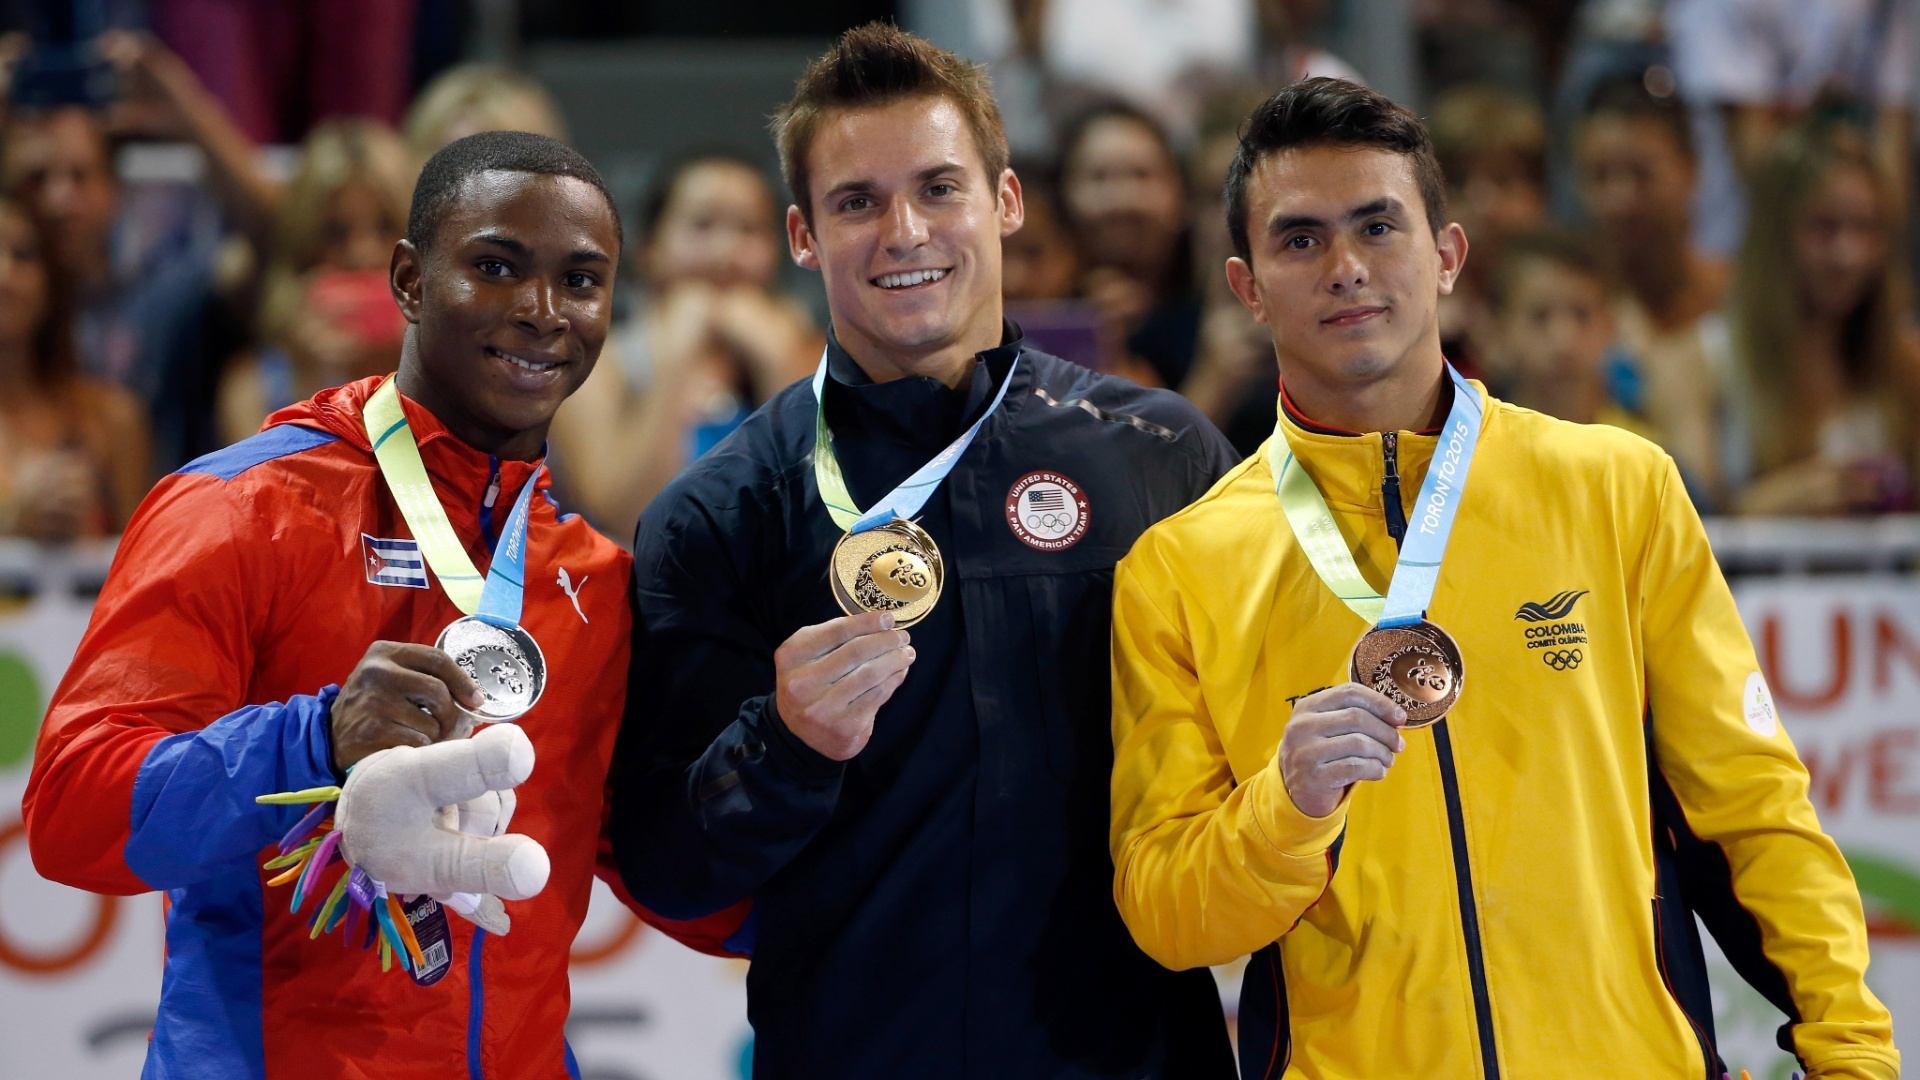 Manrique Larduet, de Cuba, Samuel Mikulak, dos Estados Unidos, e Jossimar Calvo Moreno, da Colômbia, no pódio do individual geral da ginástica artística